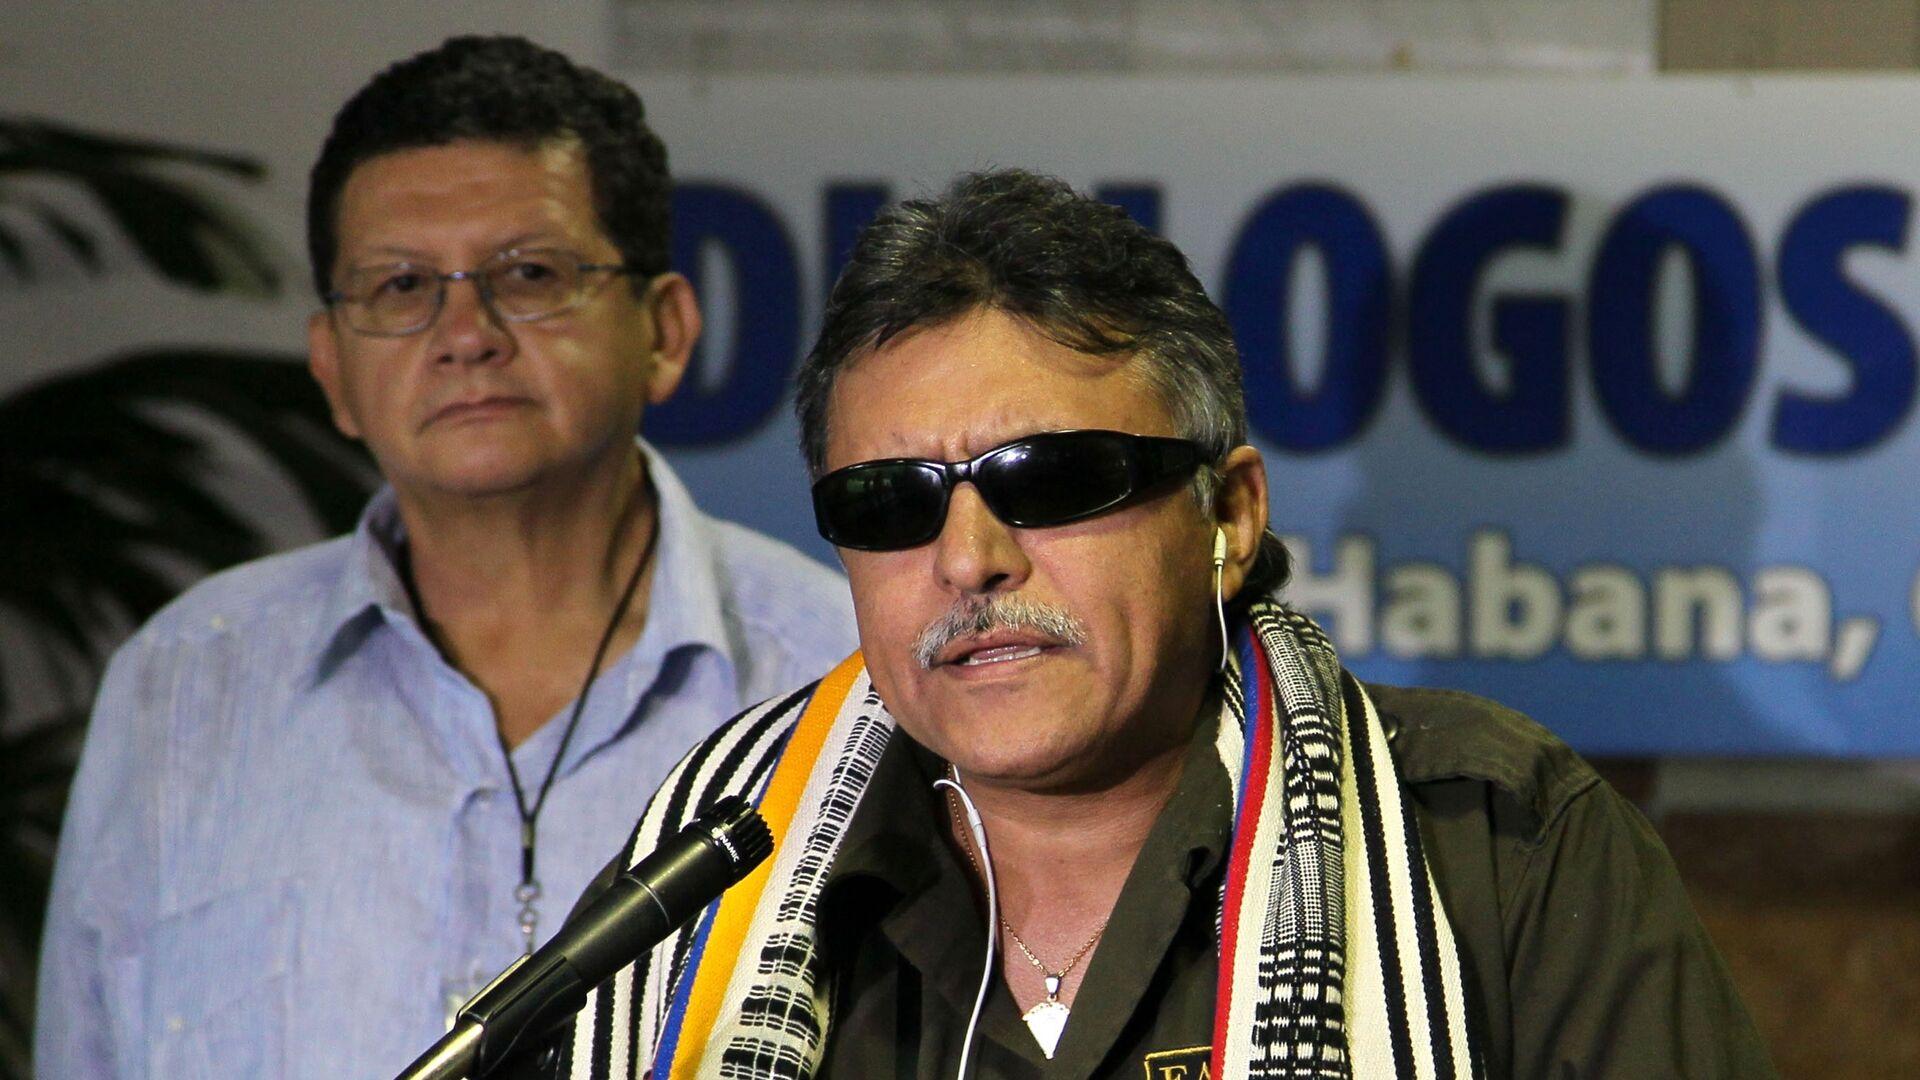 Jesús Santrich, exguerrillero colombiano, integrante del partido político FARC - Sputnik Mundo, 1920, 19.05.2021